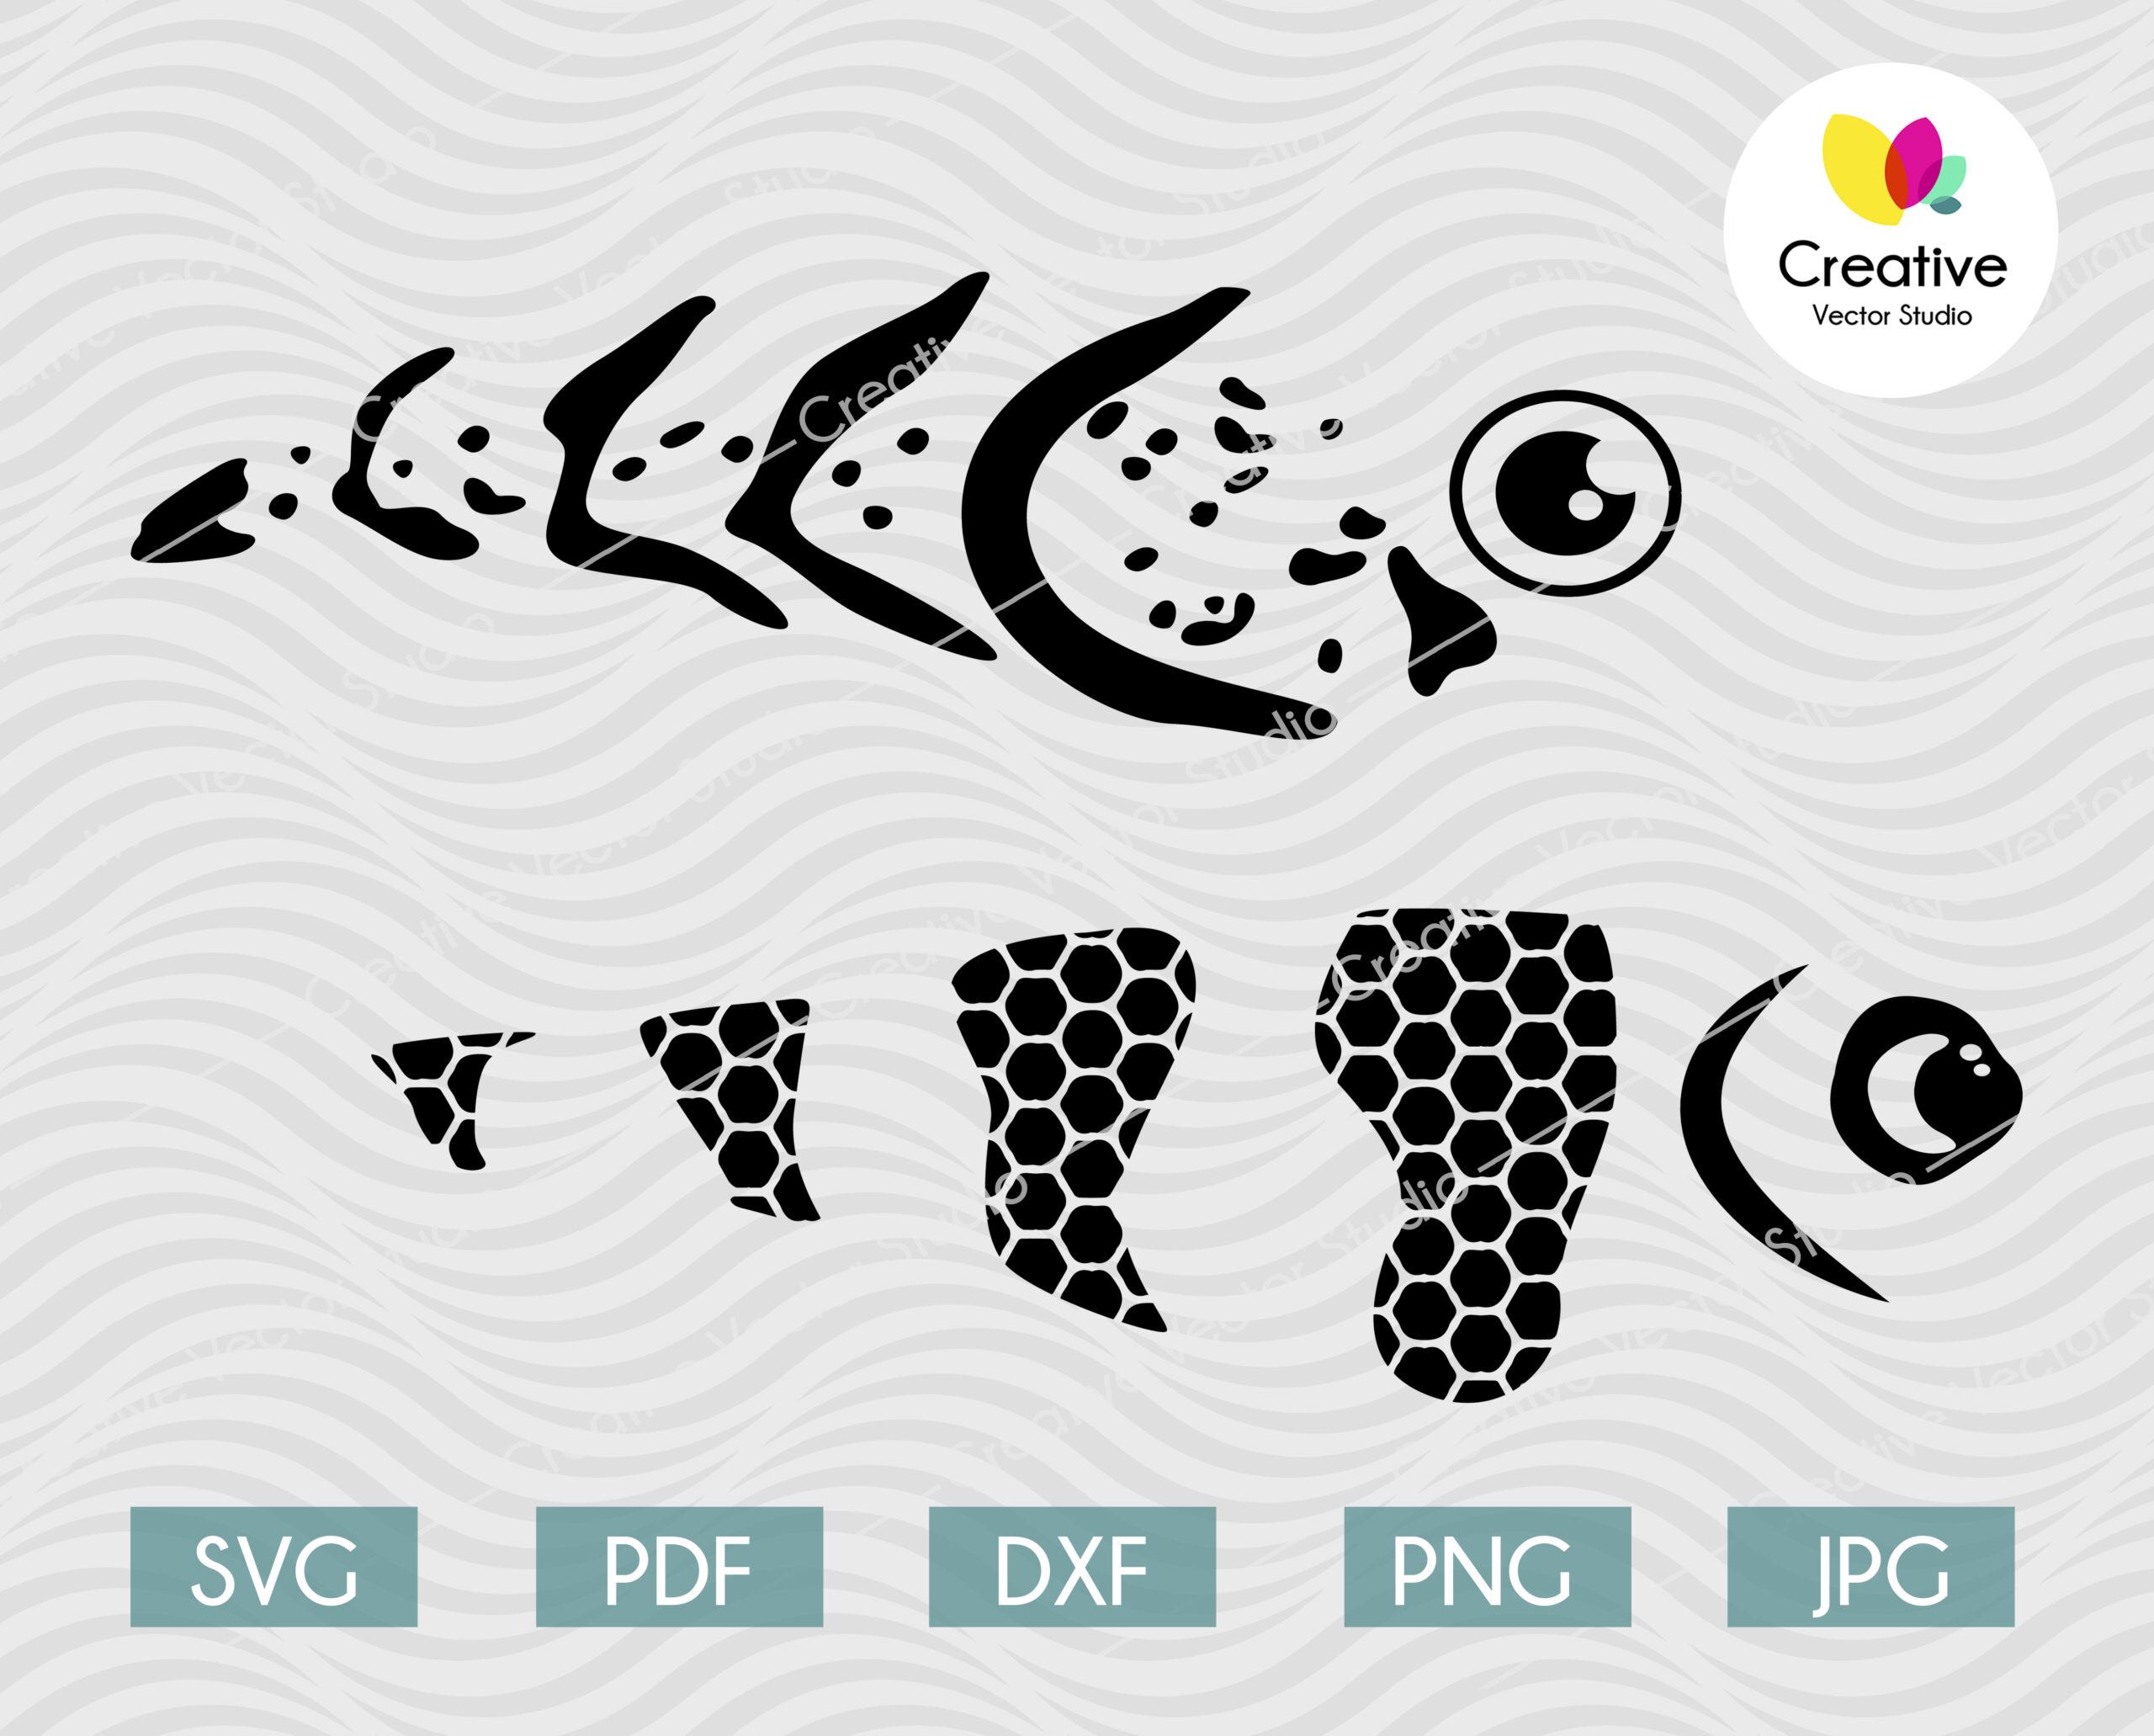 Download Fishing Lure Svg Bundle 2 Creative Vector Studio